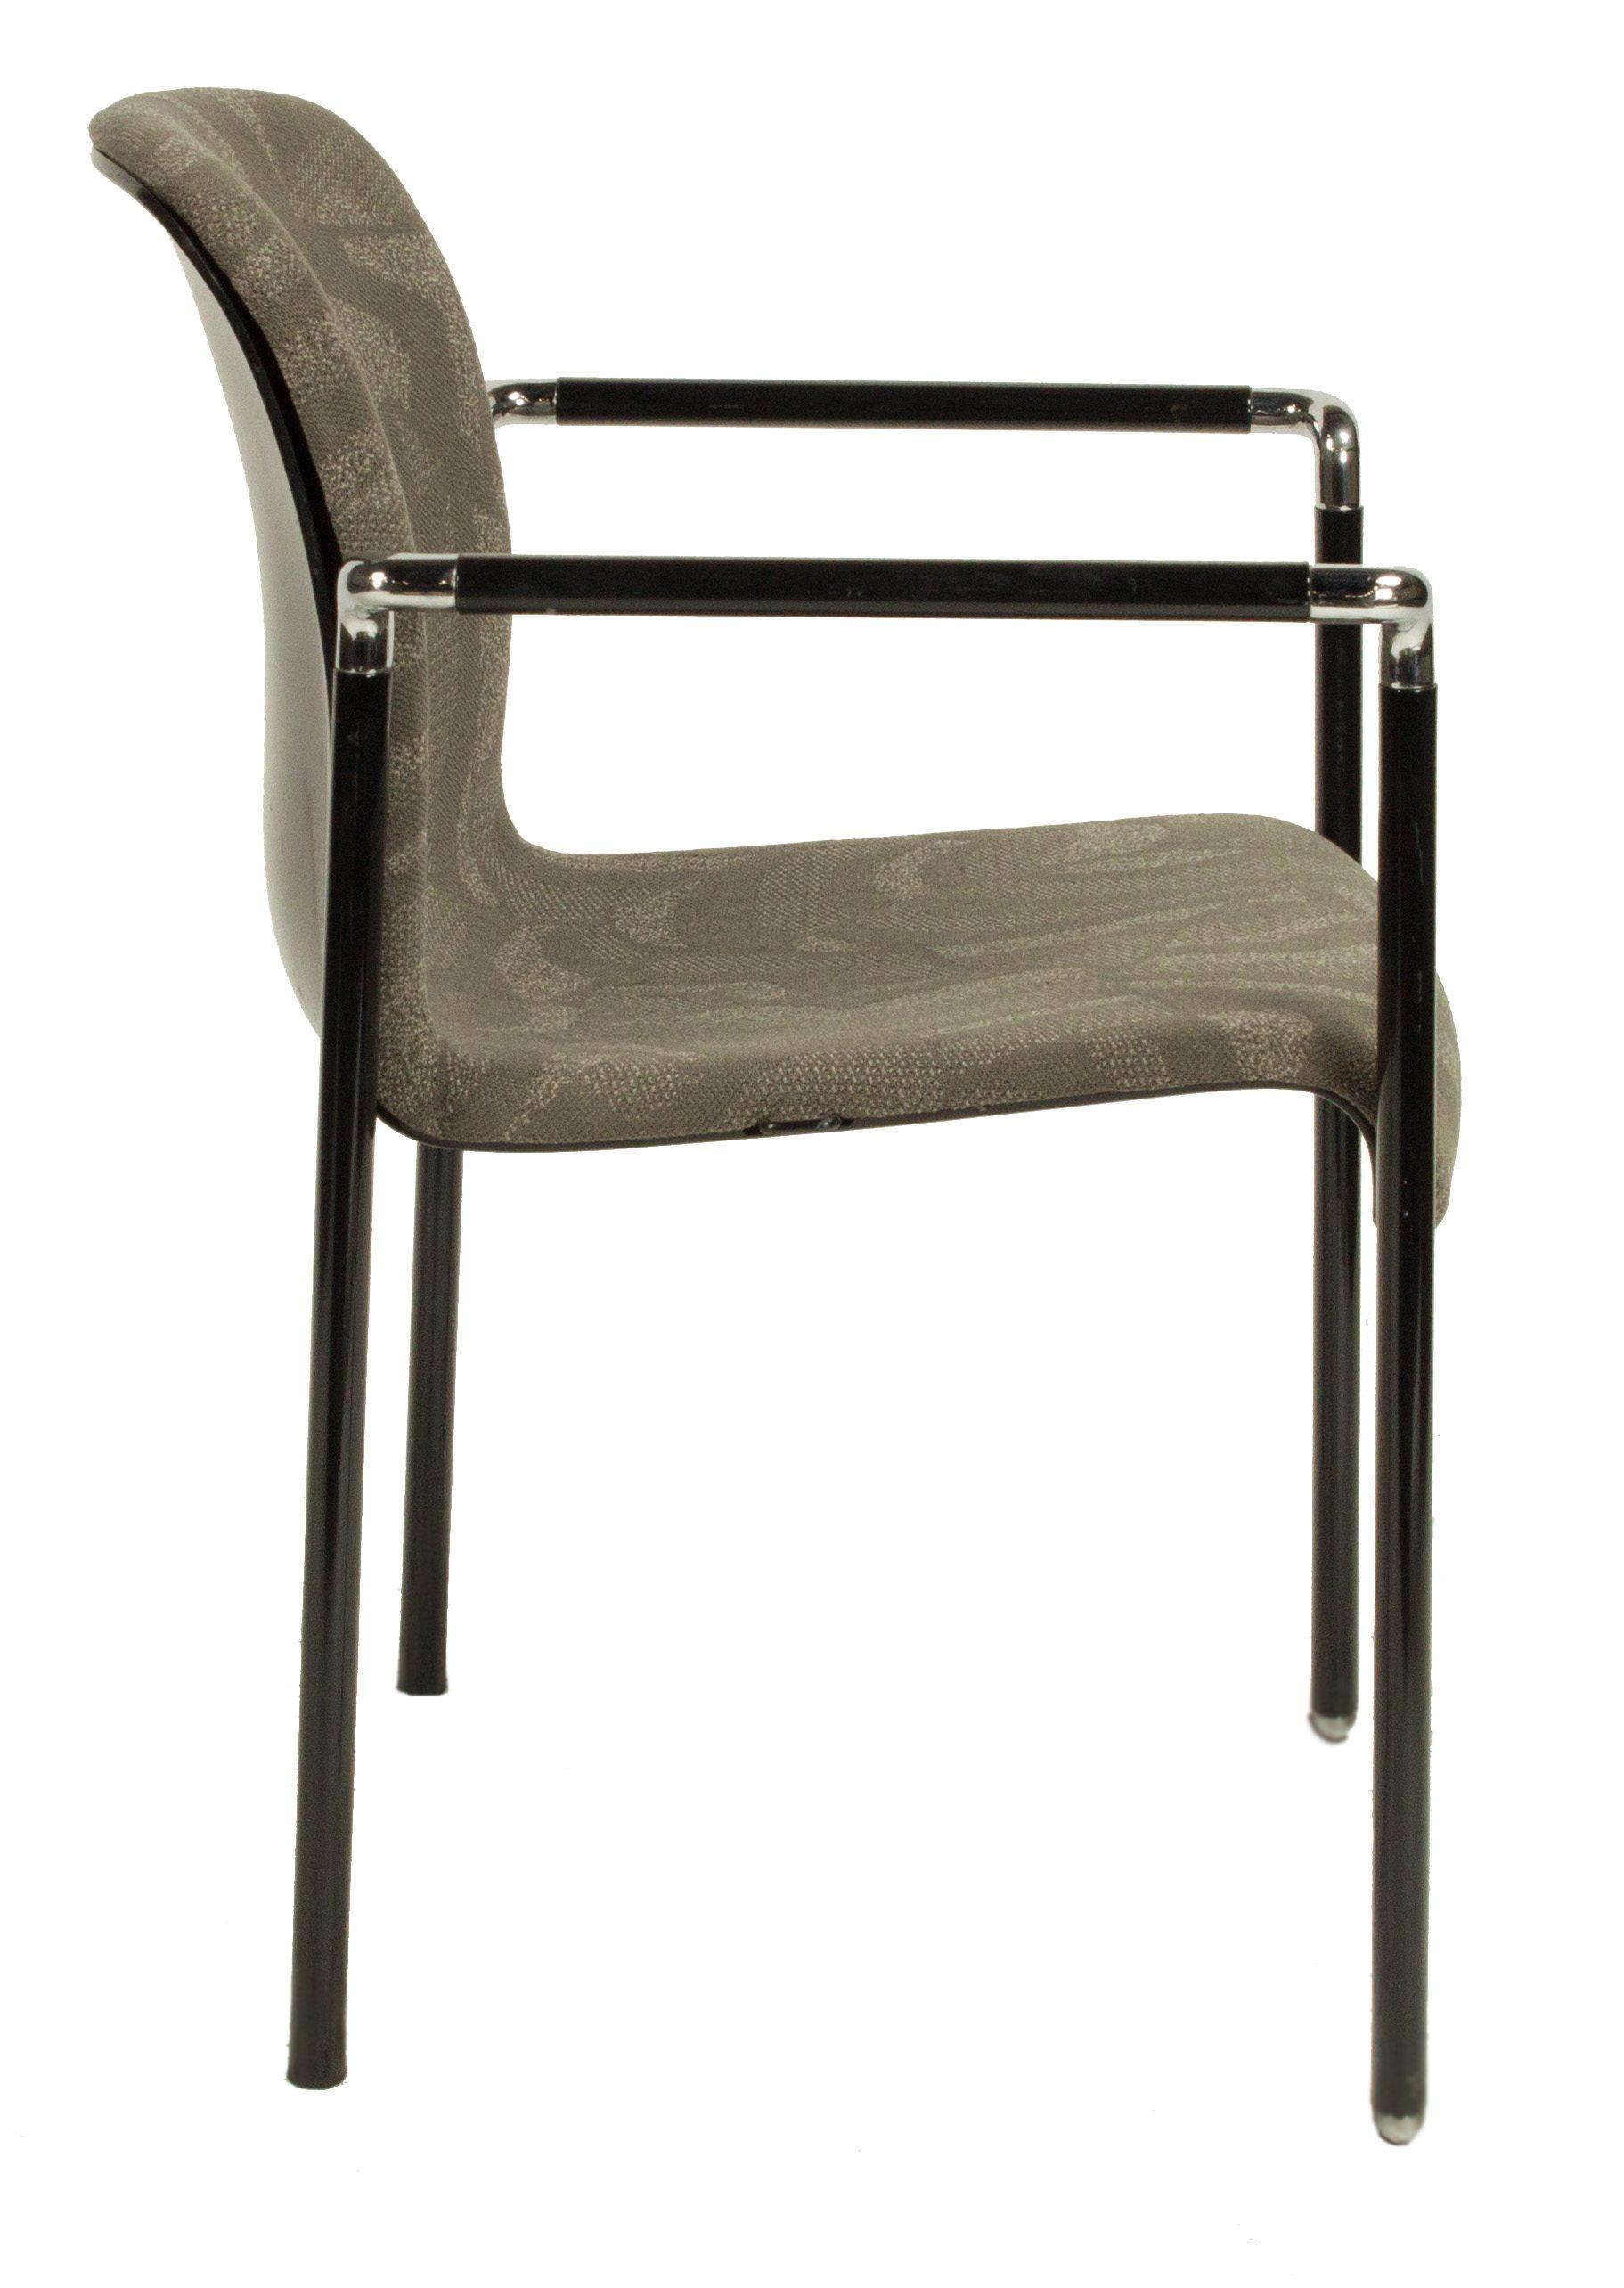 Herman Miller Used Side Chair, Leaf  National Office Interiors and Liquidators